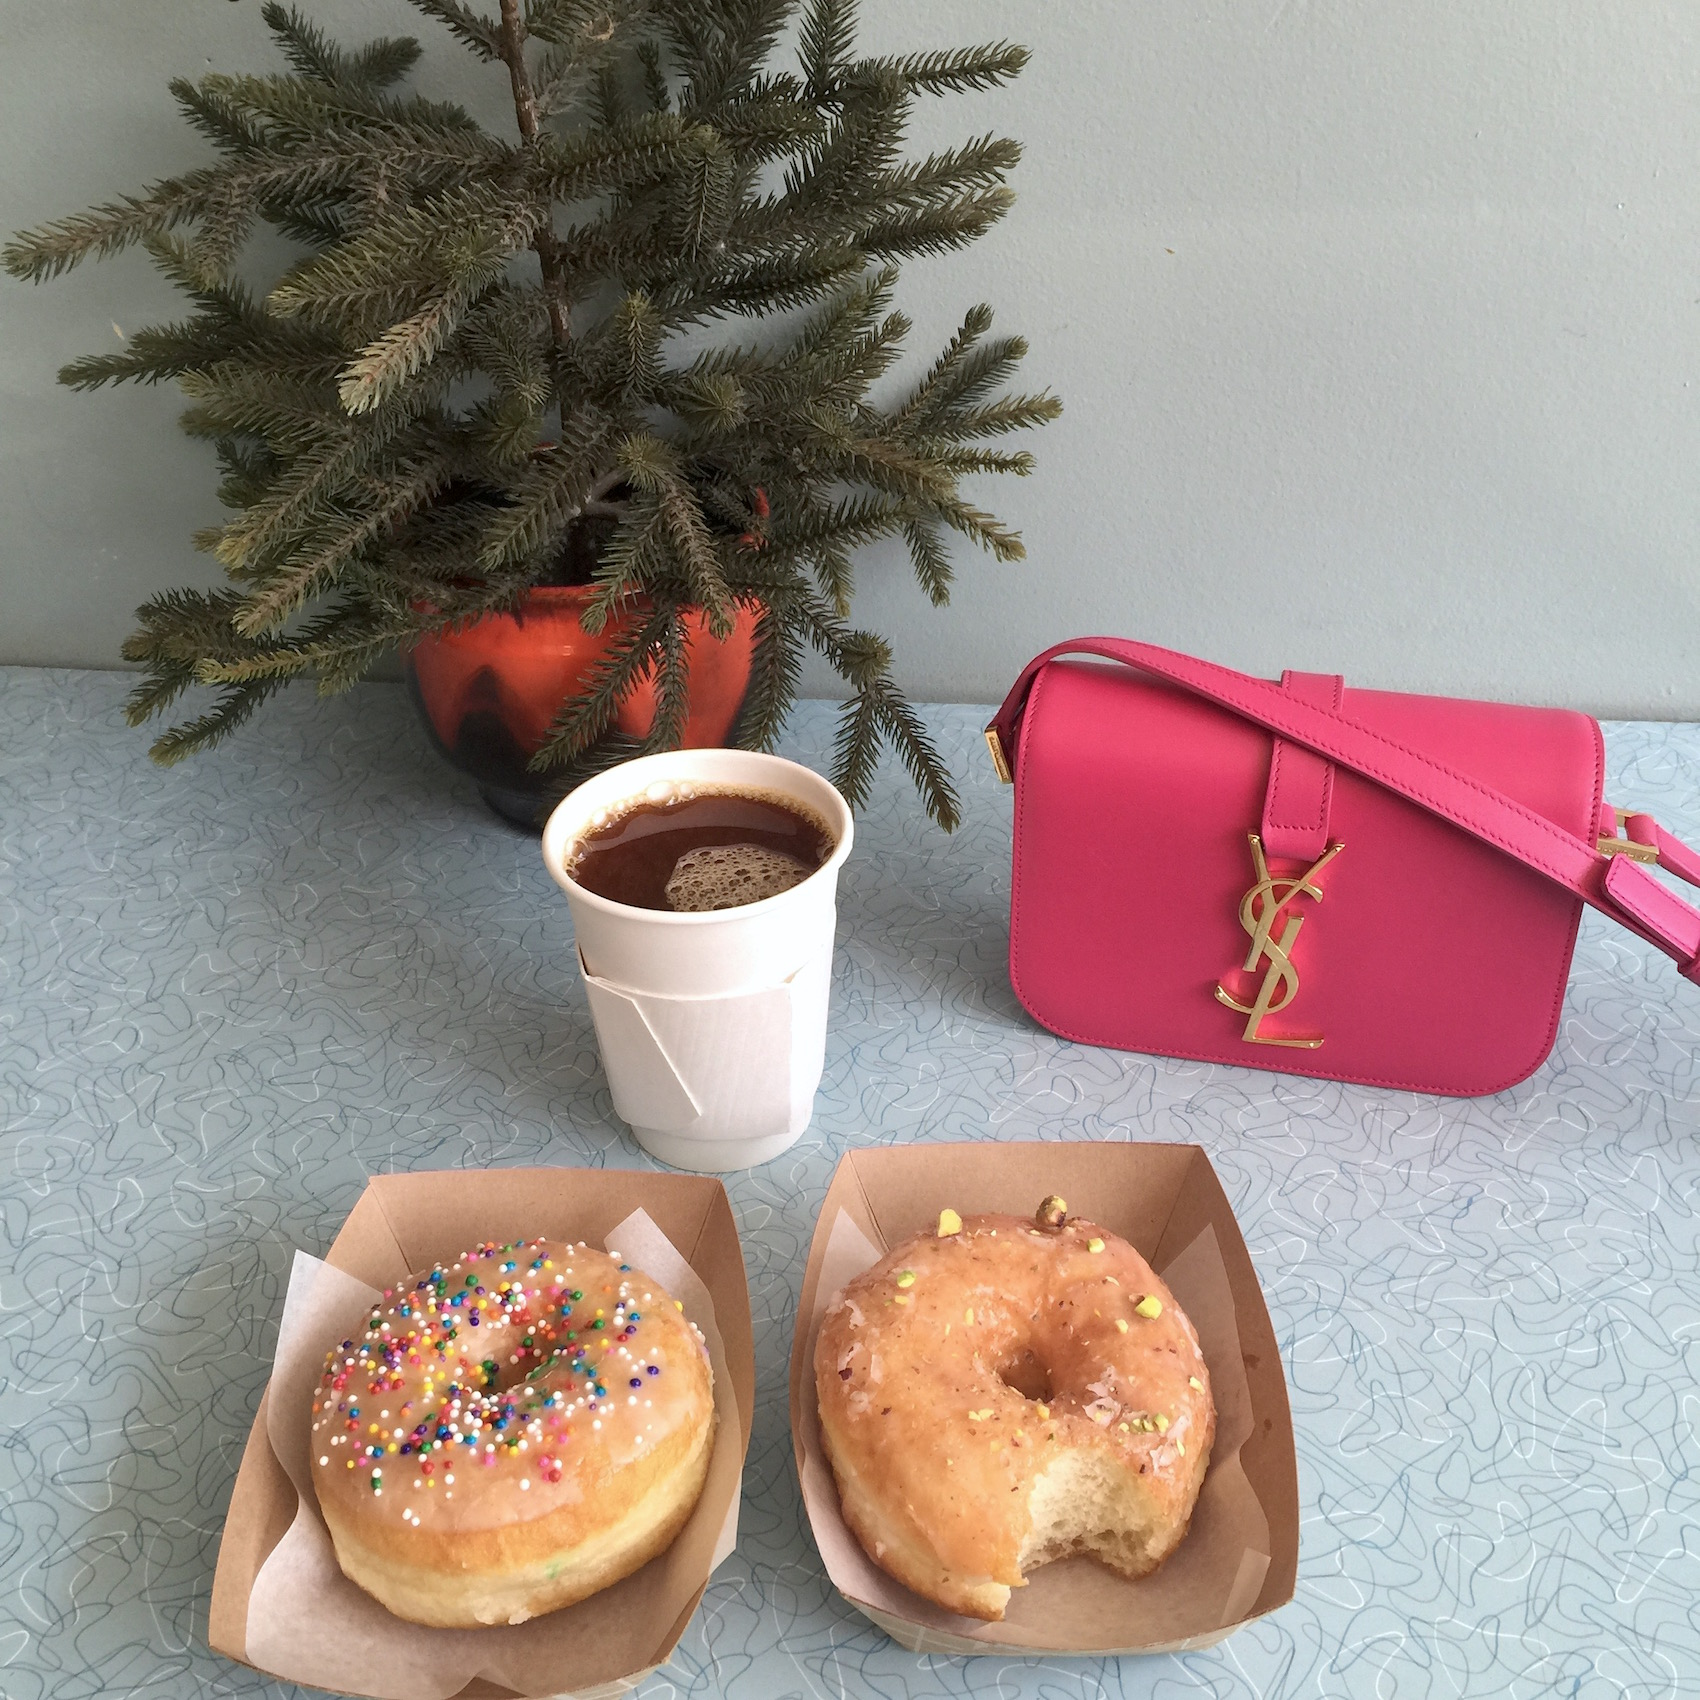 WoahStyle.com_Best of Toronto Mini Food Tour-Diary_Best Handmade Donuts_Glory Hole Donuts_vegan_YSL_Saint Laurent Paris_Pink Monogram cross body bag_4363.jpg